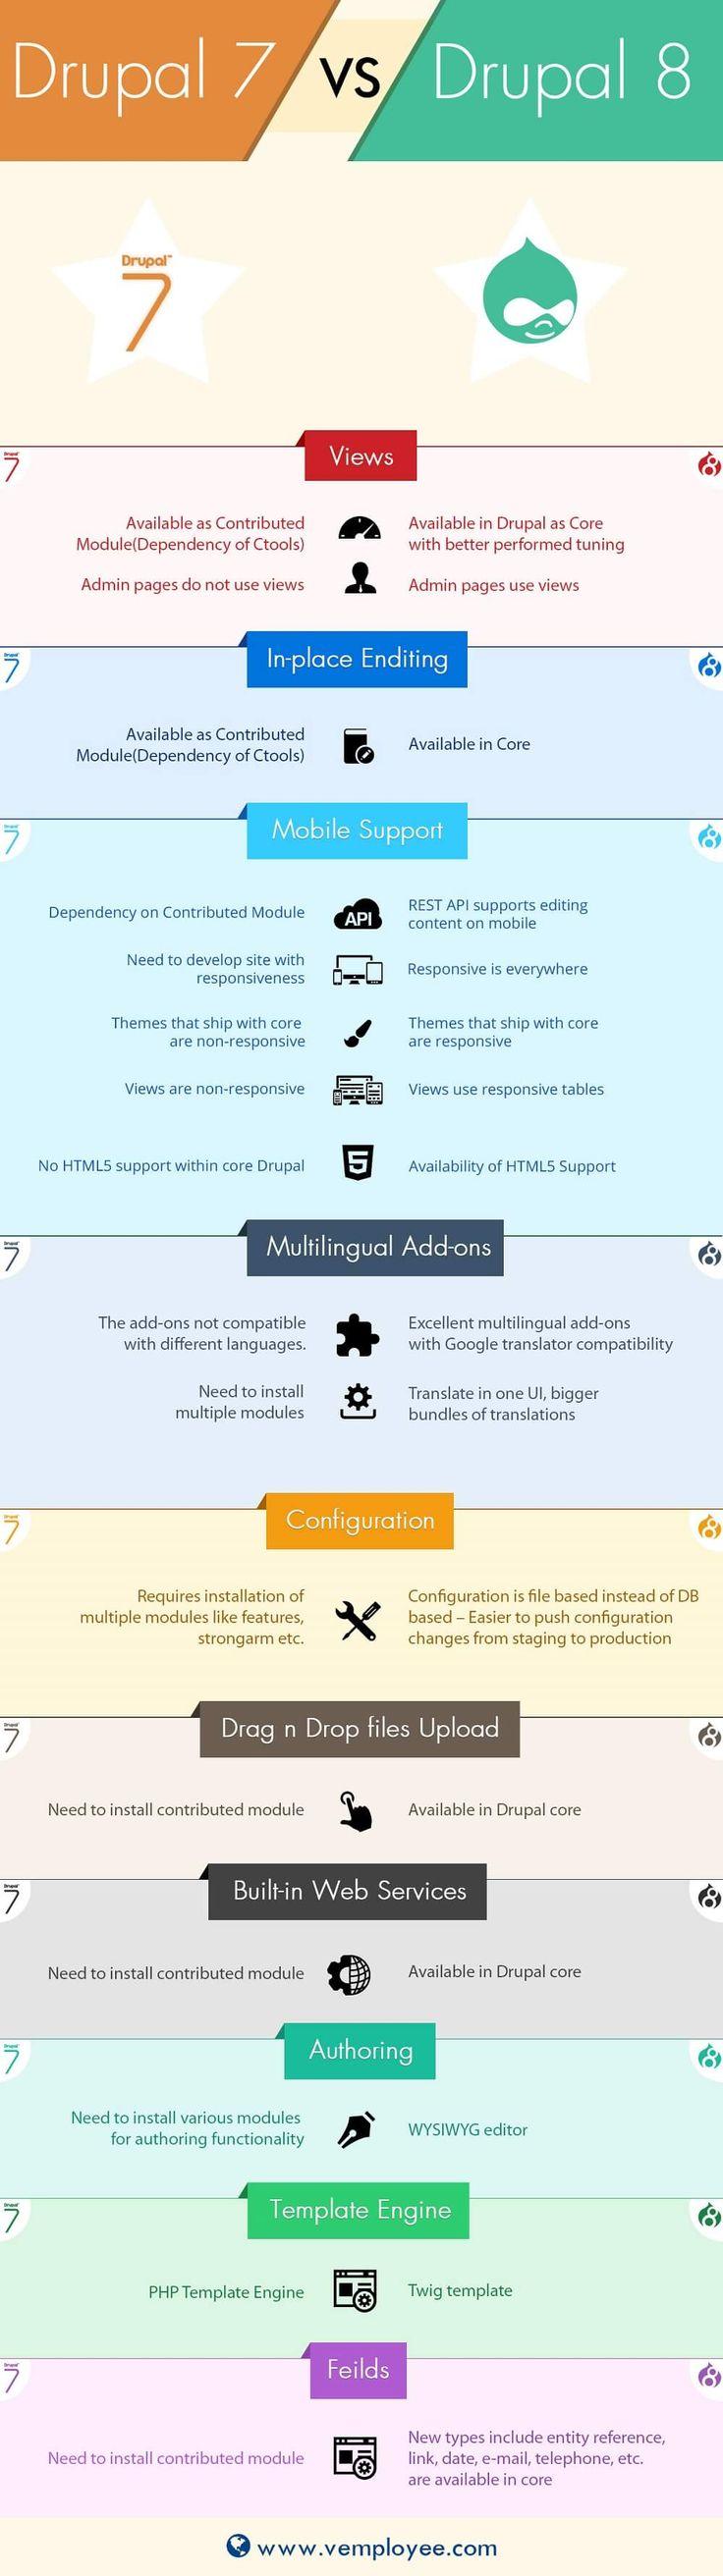 WordPress Basic Training - Information Resources Management